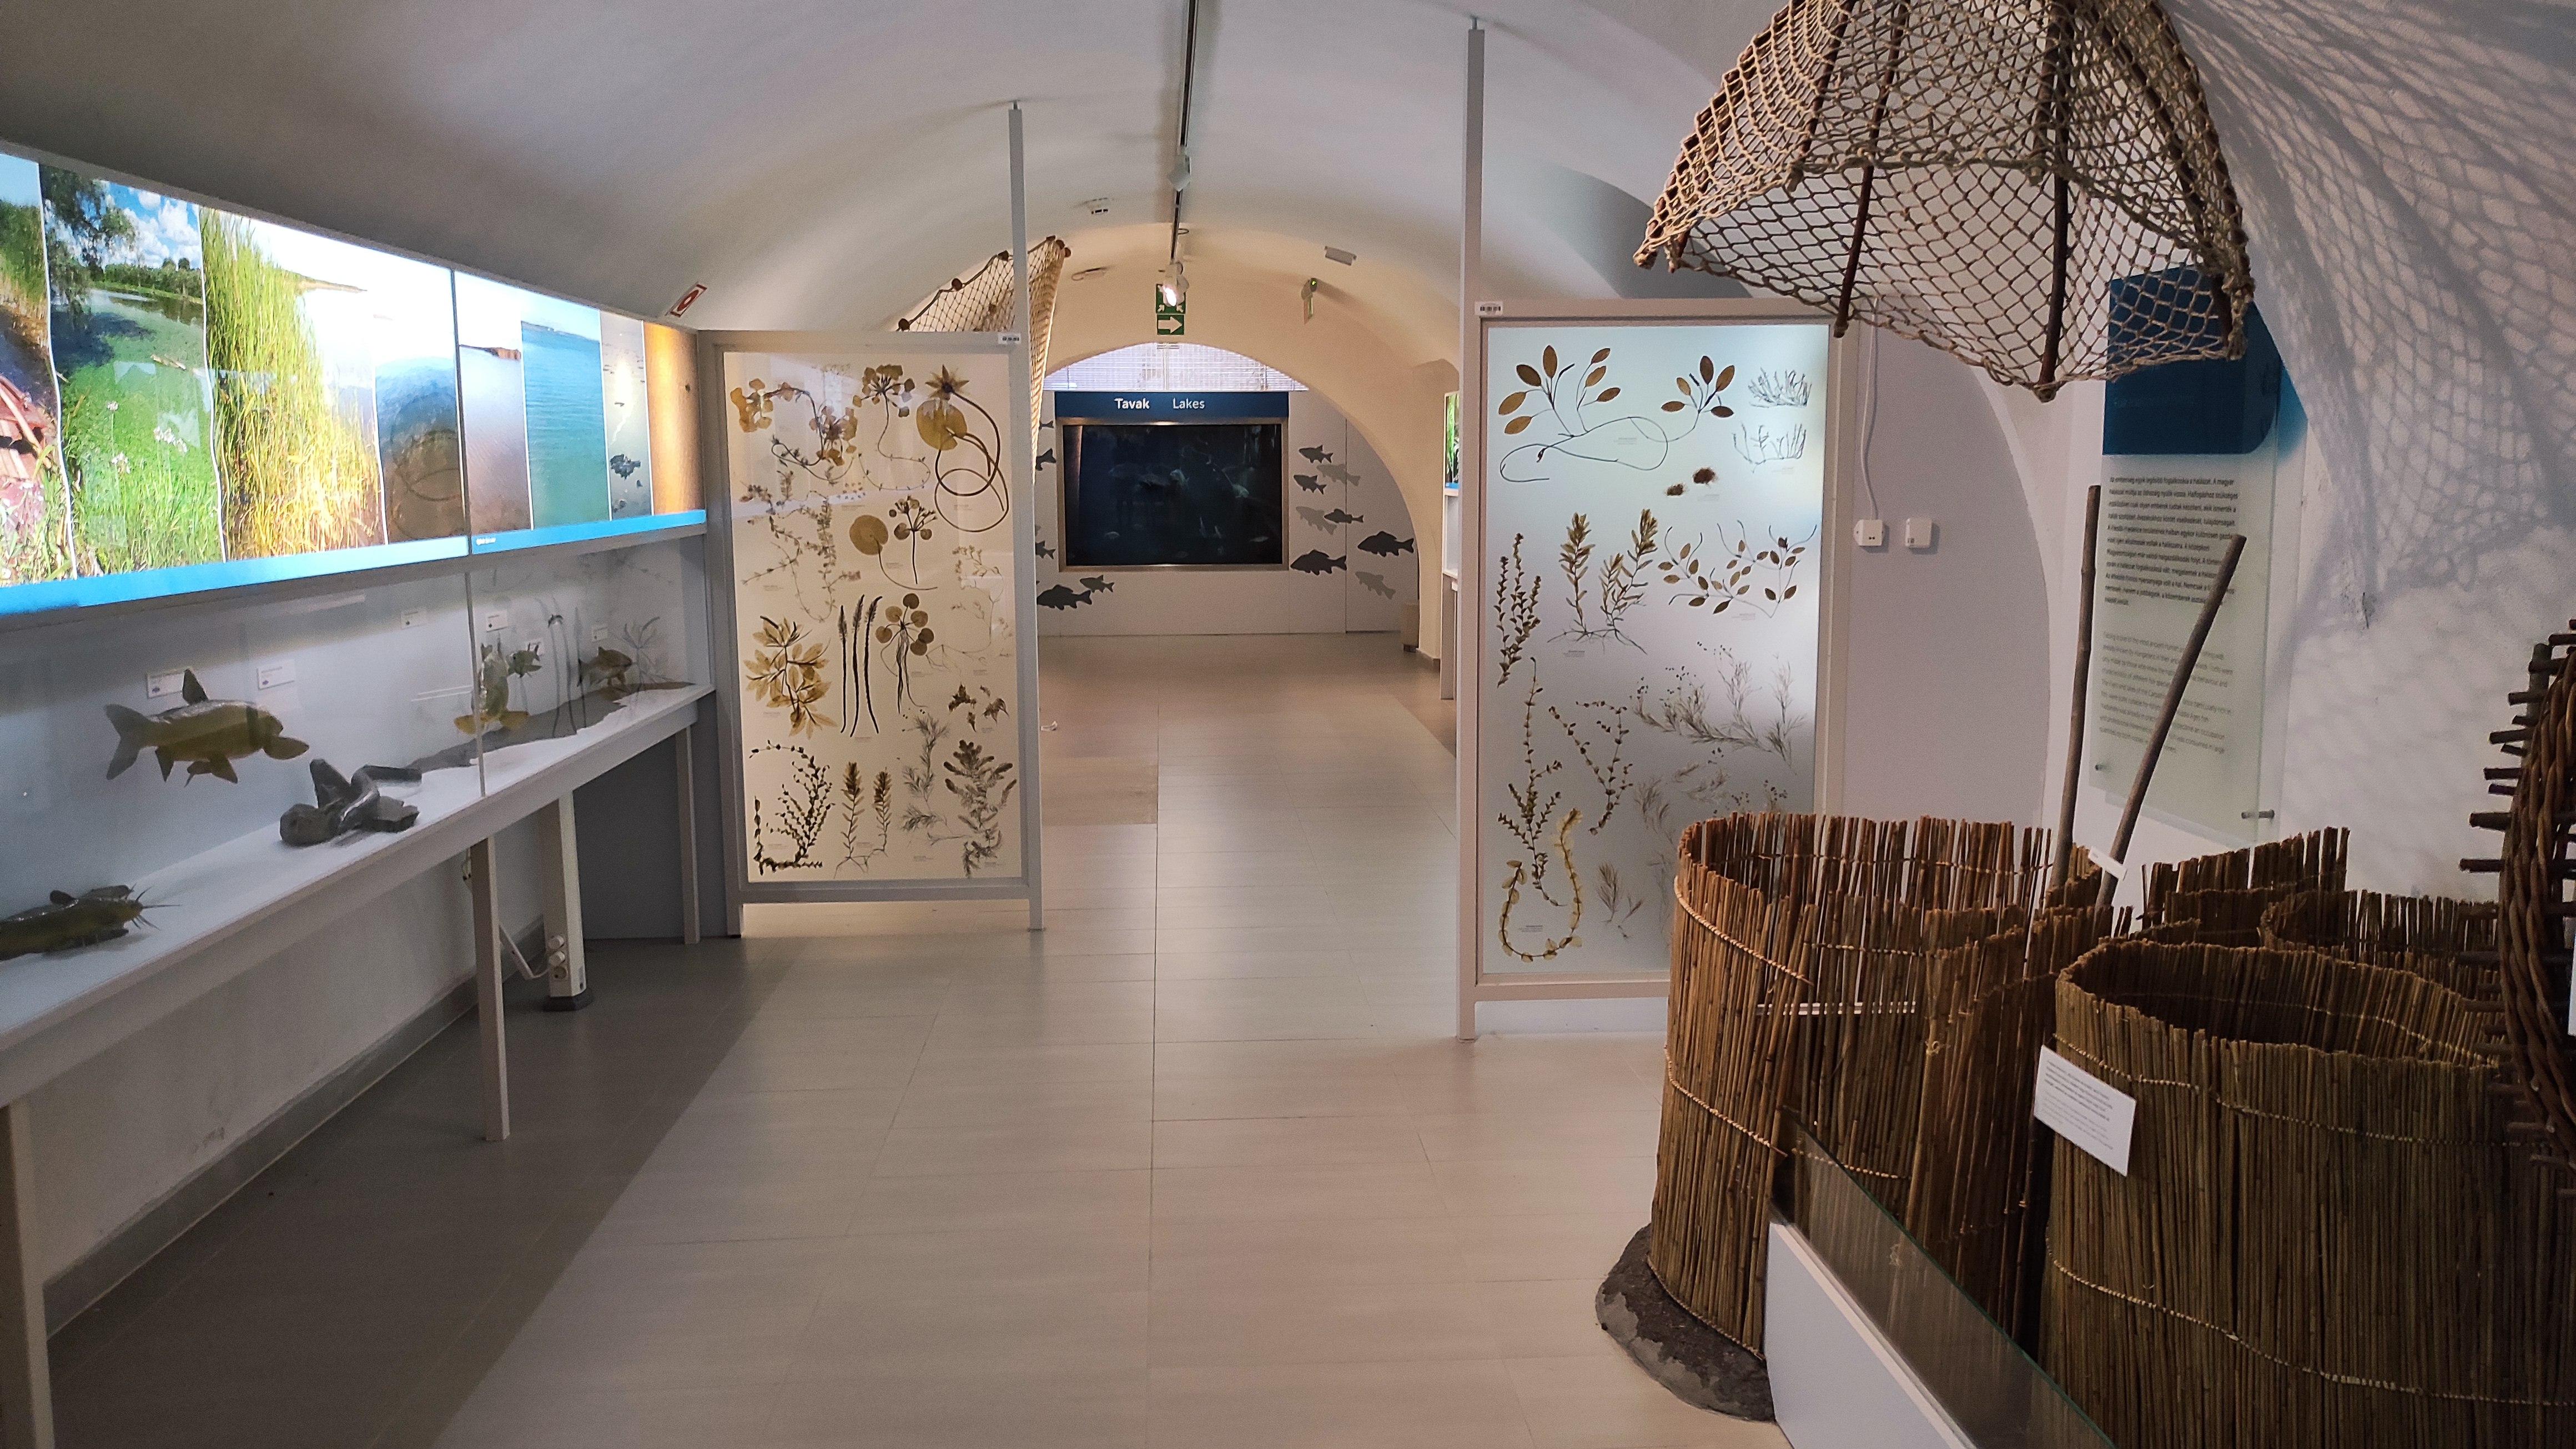 Kirandulastervezo-Hatvan-Vadaszati-Muzeum-15.jpg